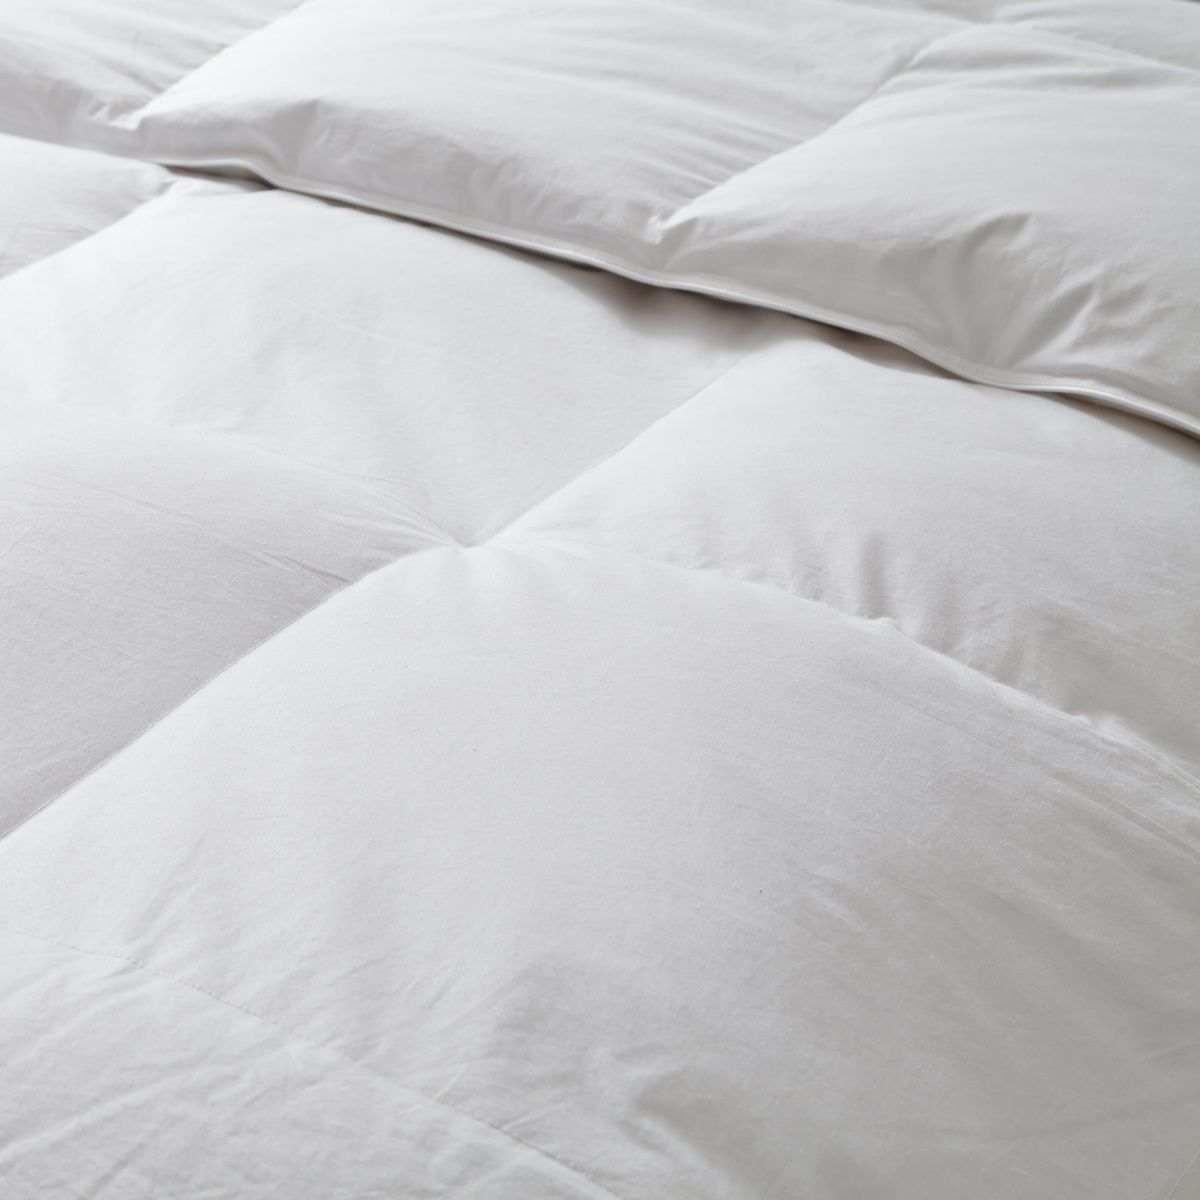 couette 30 duvet canard couette naturelle tradition. Black Bedroom Furniture Sets. Home Design Ideas